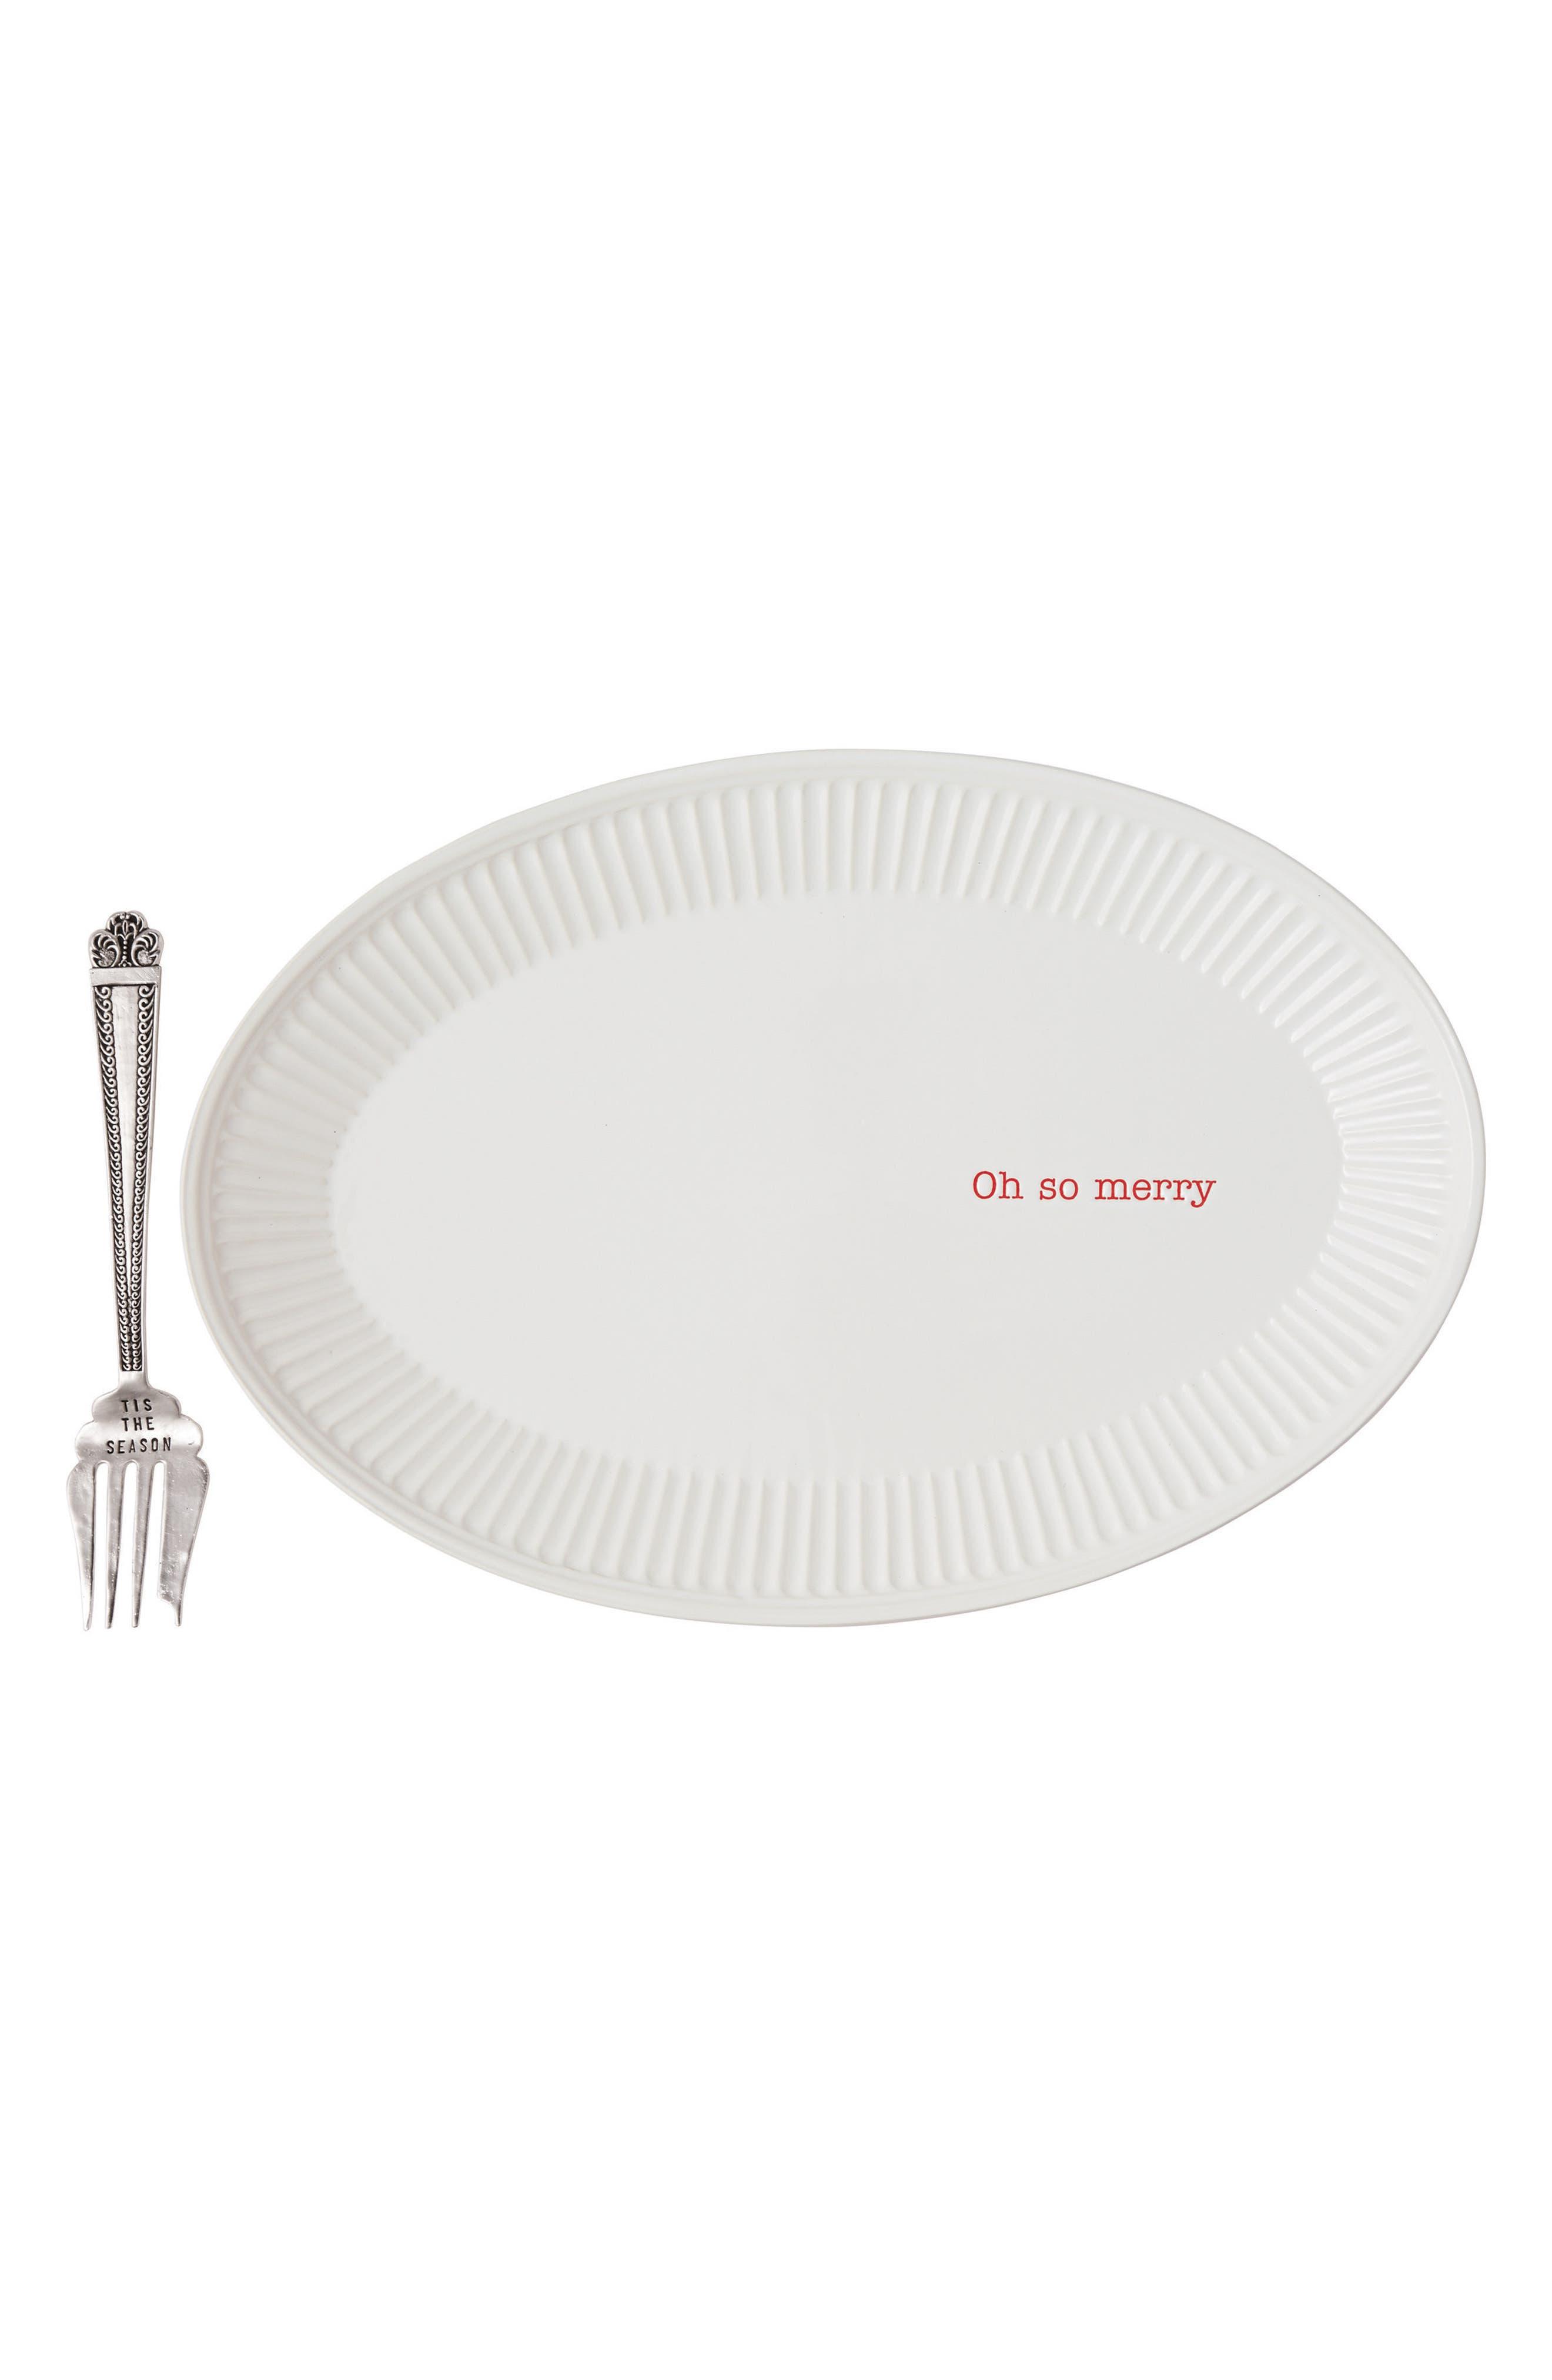 Oh So Merry Ceramic Platter & Serving Fork,                         Main,                         color, 100